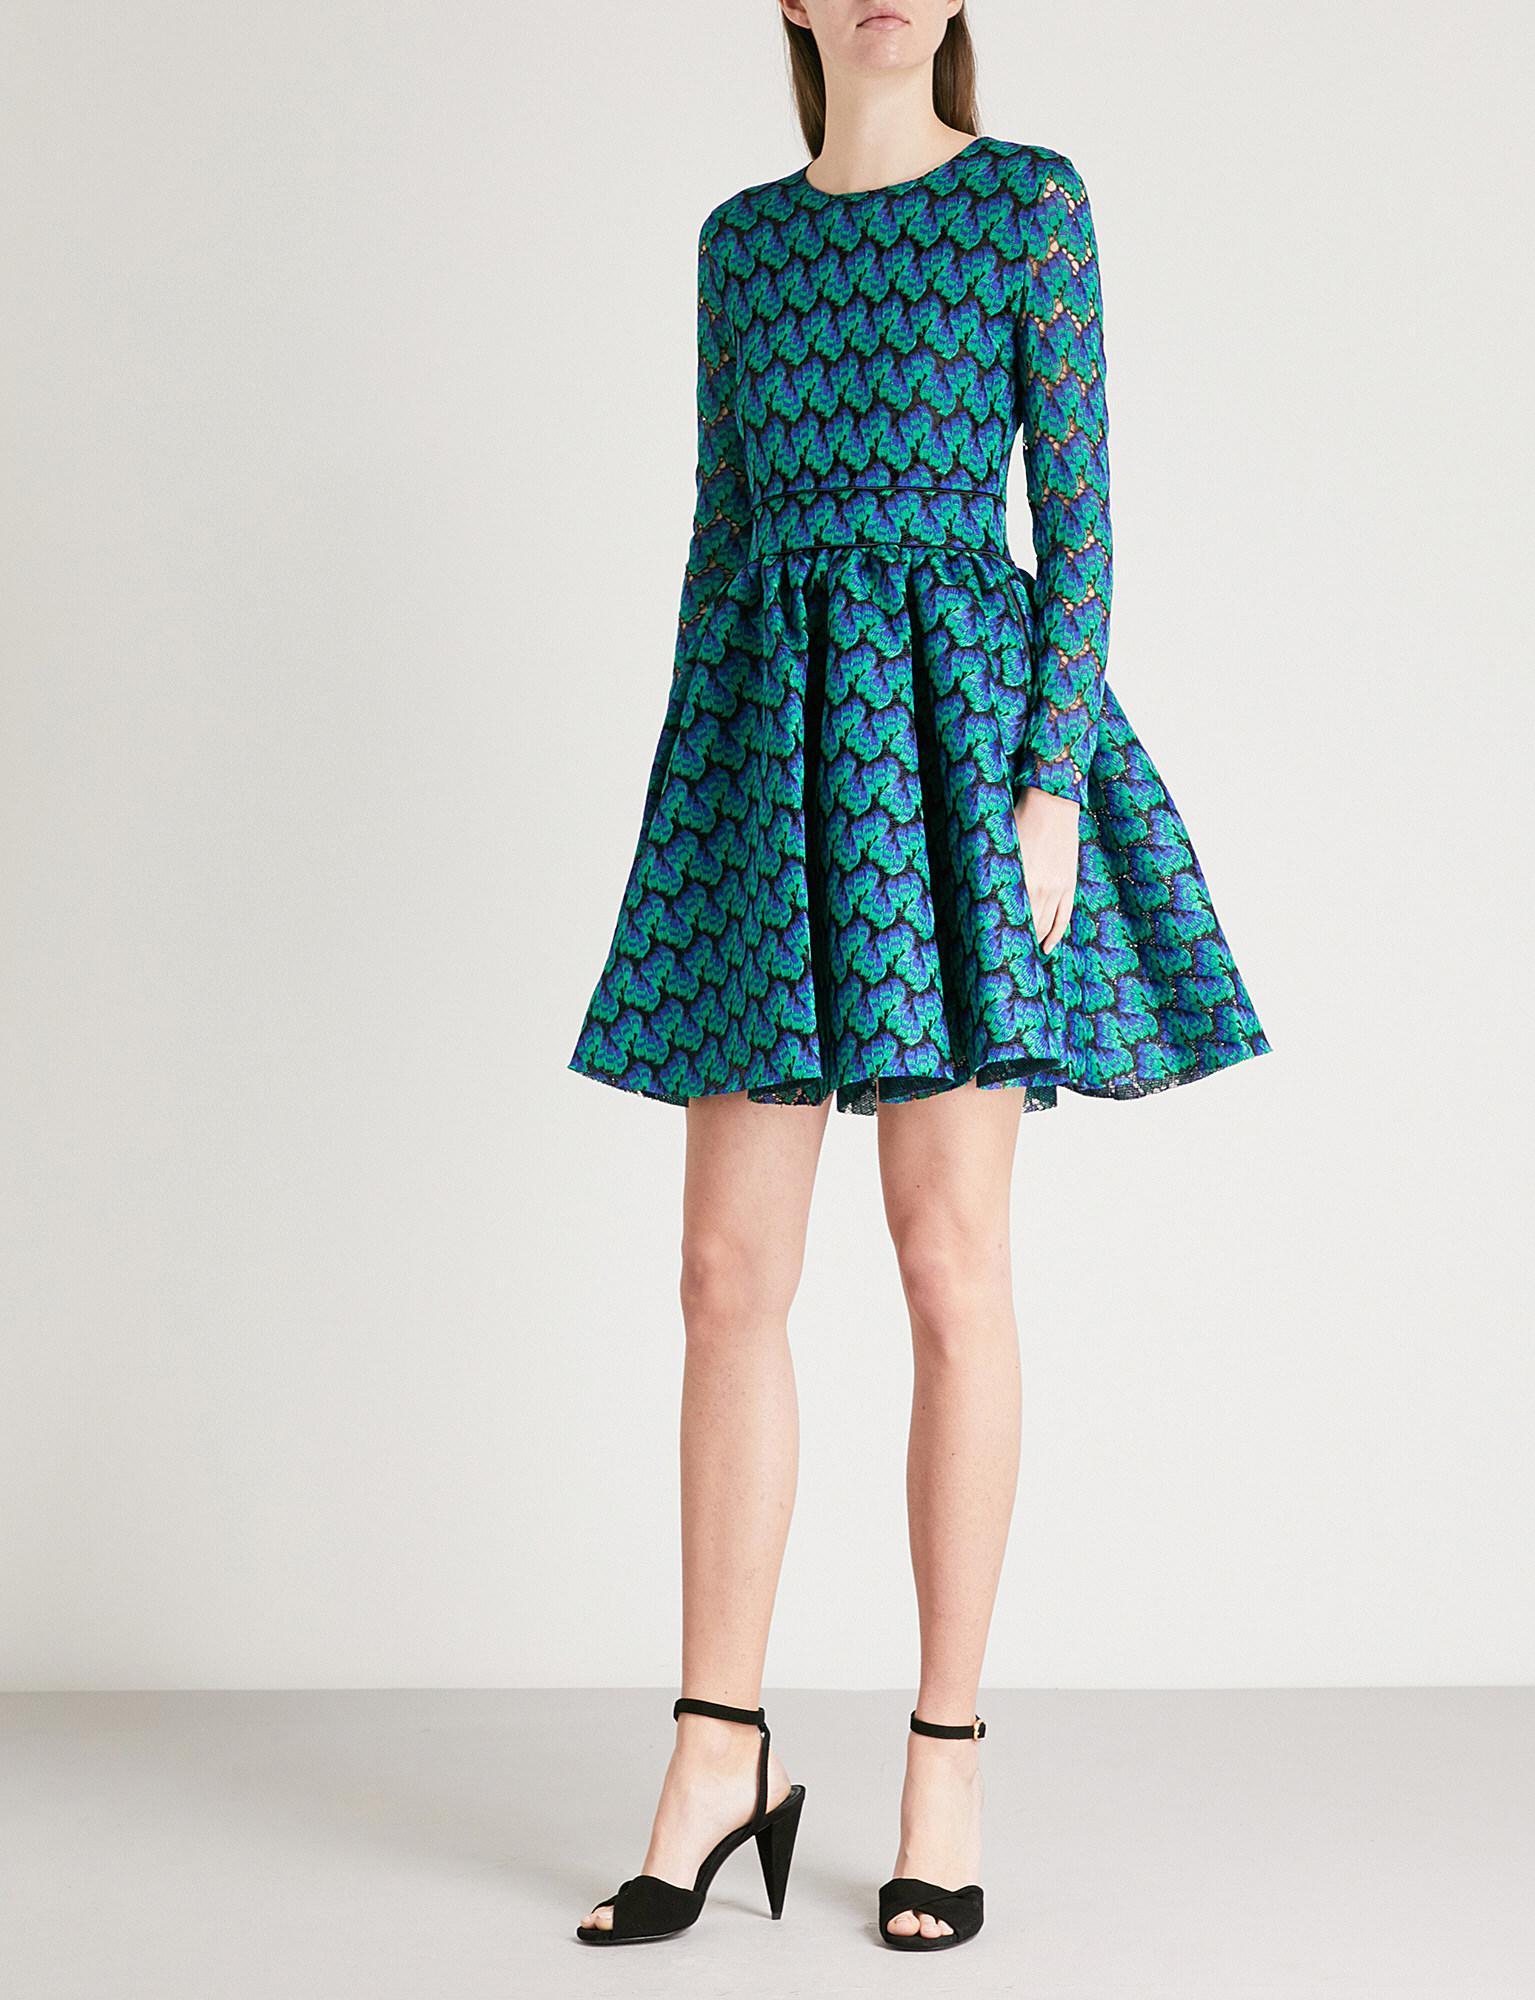 Exelent Betsey Johnson Evening Tea Party Dress Model - All Wedding ...